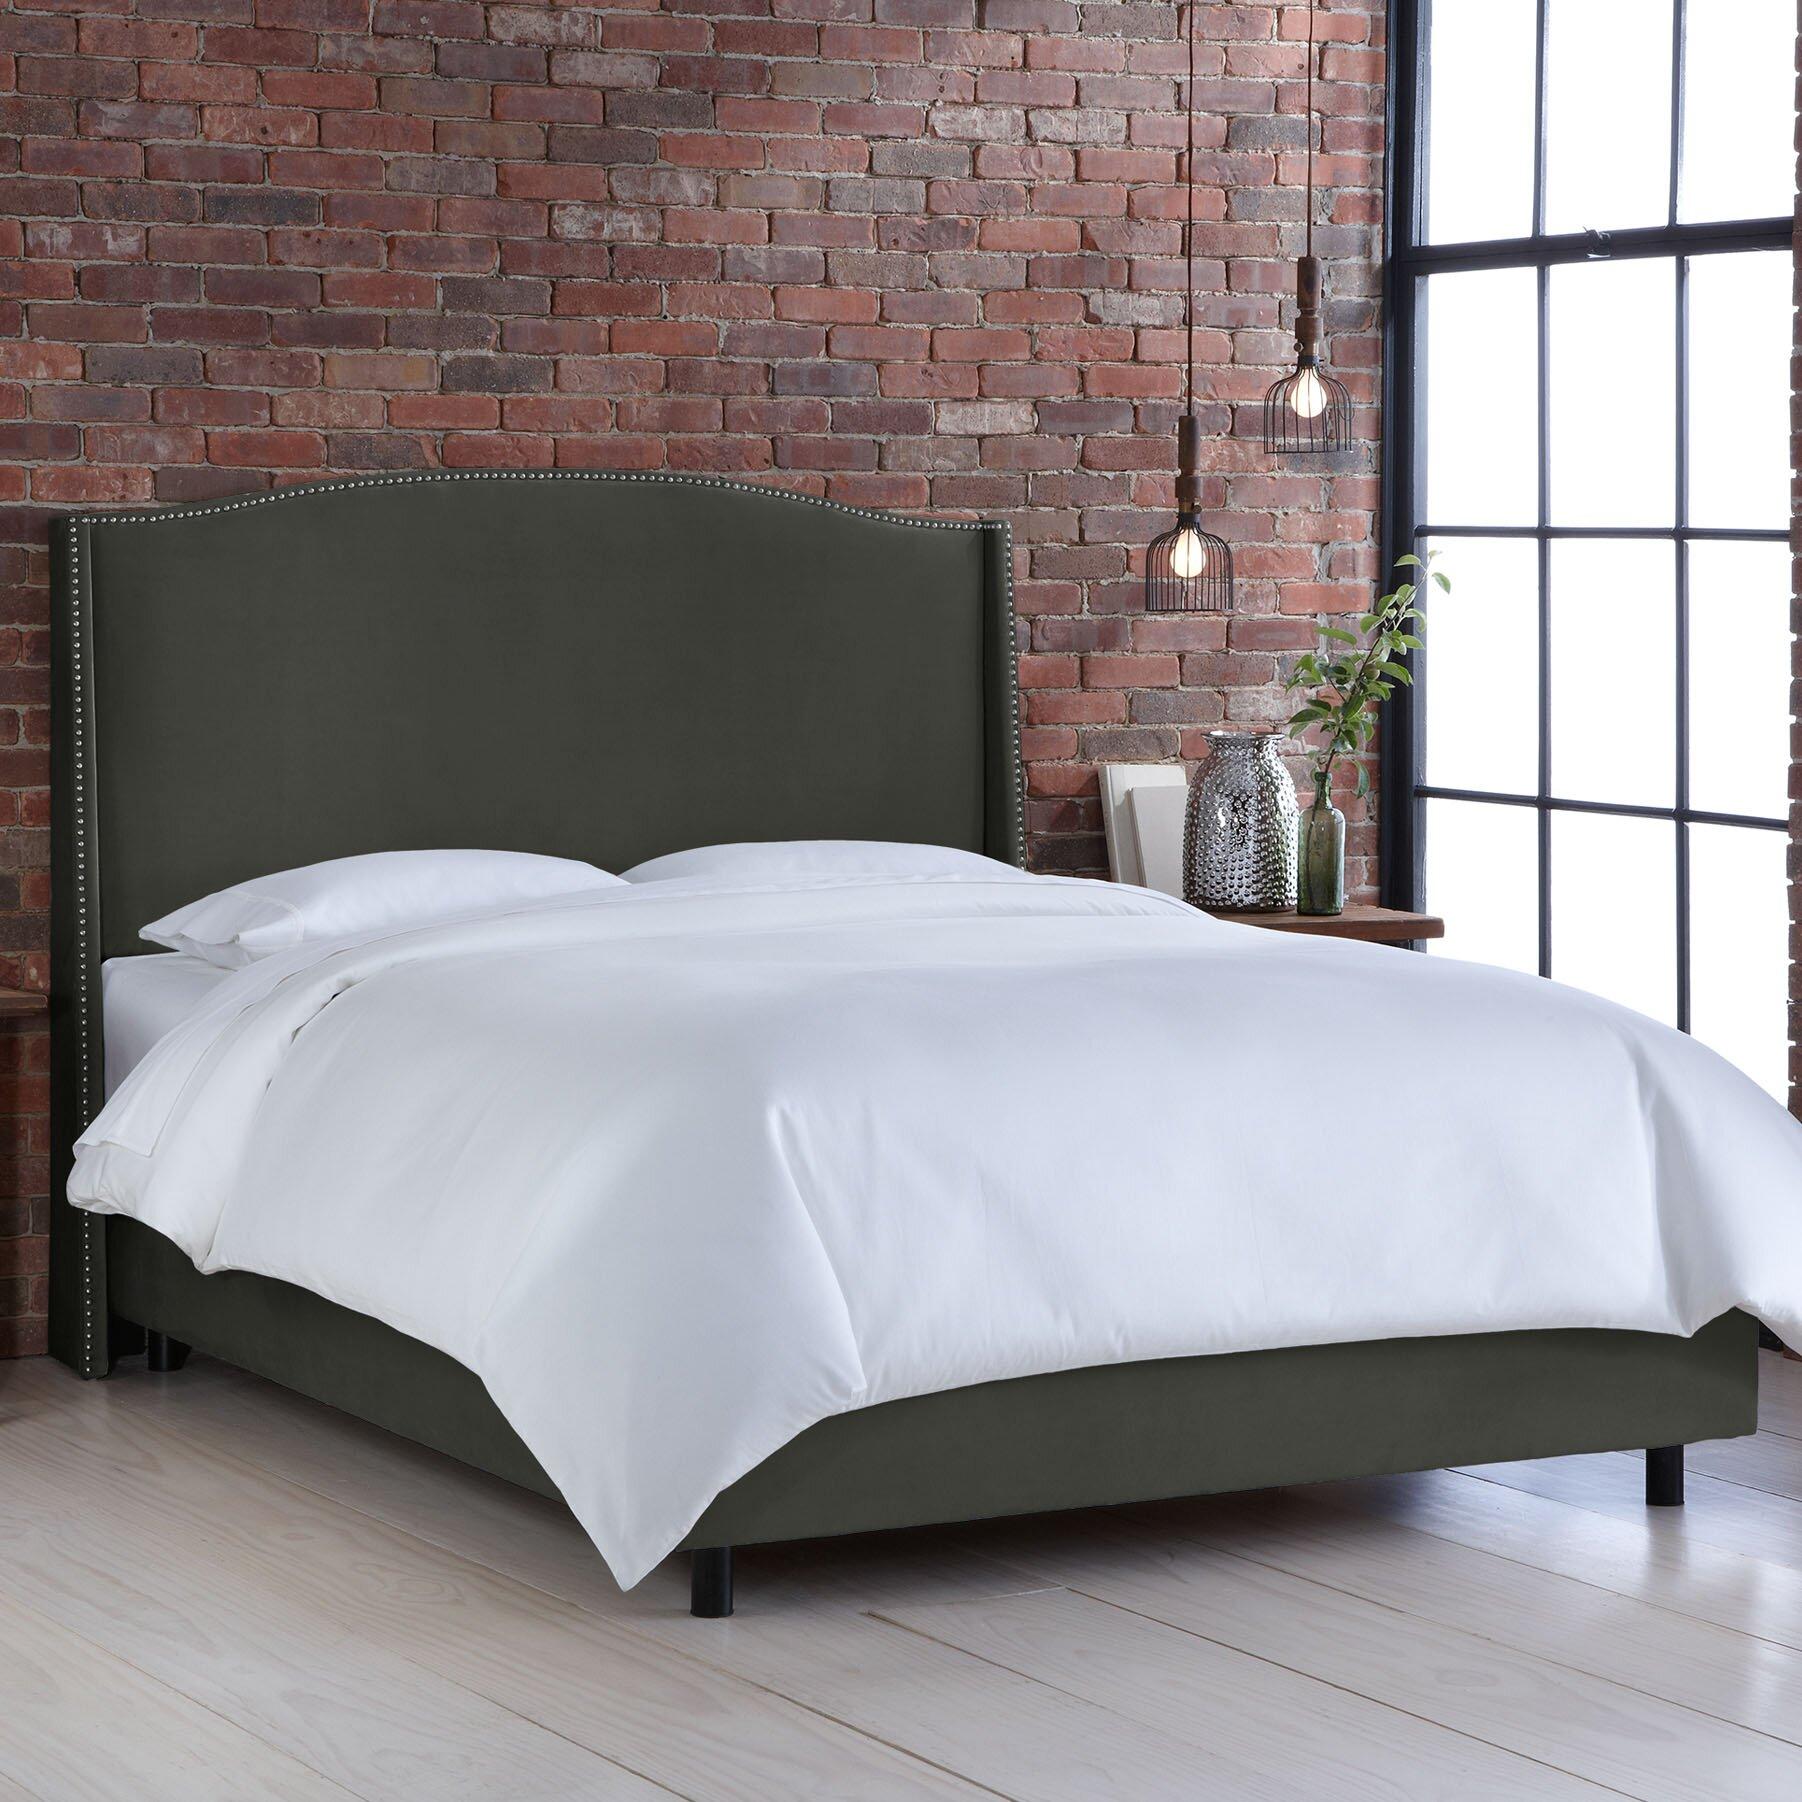 skyline furniture wingback bed | Skyline Furniture Wingback Upholstered Panel Bed & Reviews ...